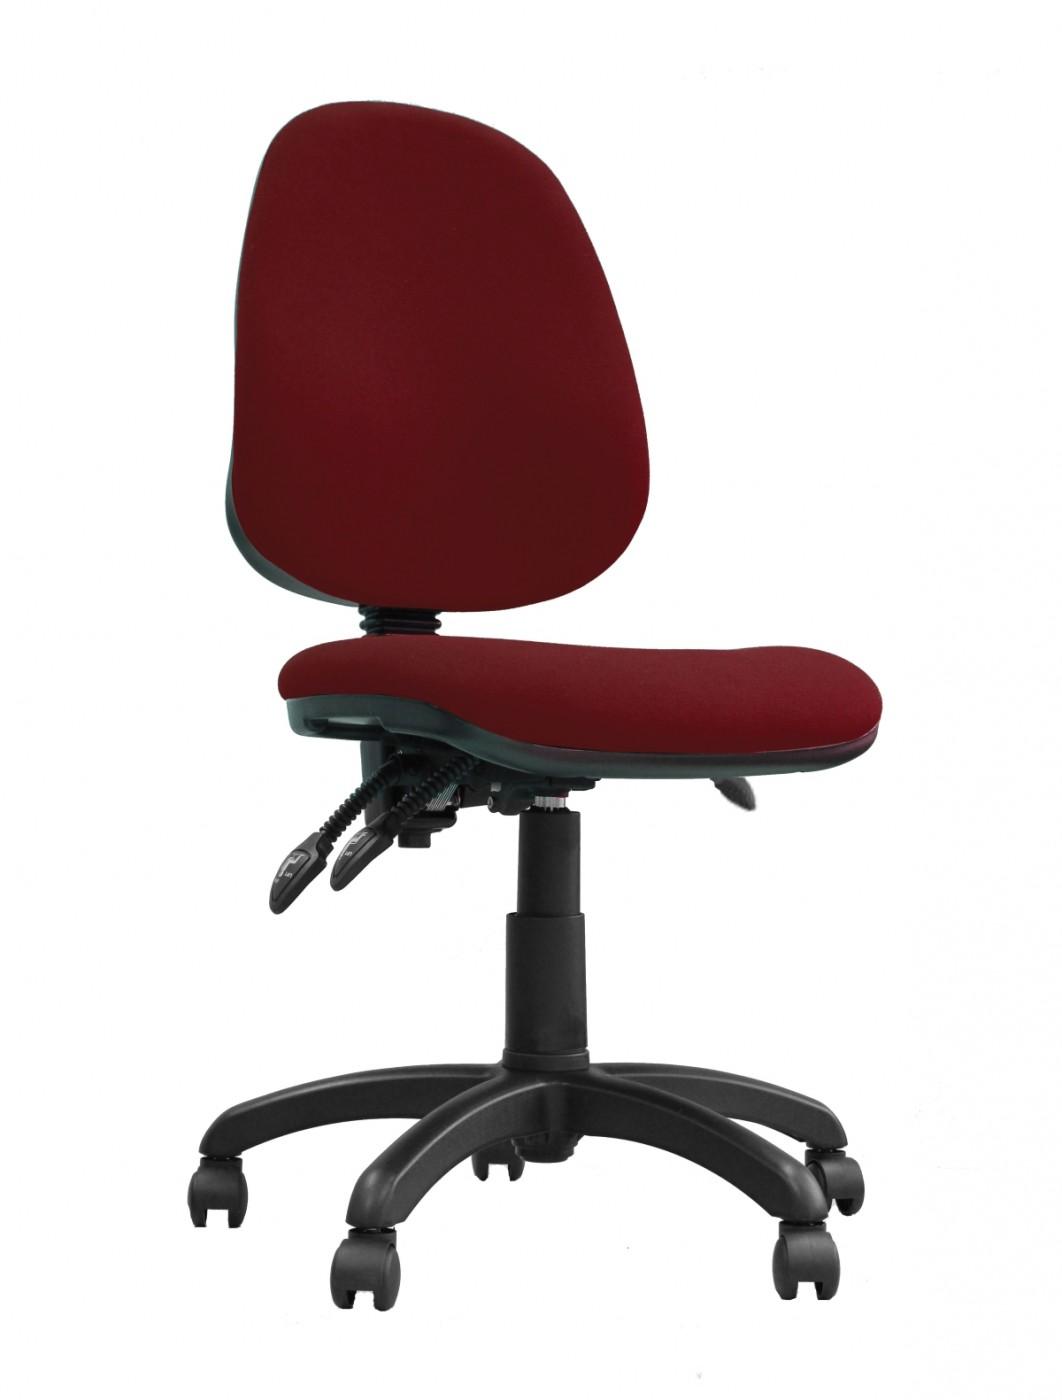 eliza tinsley java 300 high back operator chairs bcf p606 rd 121